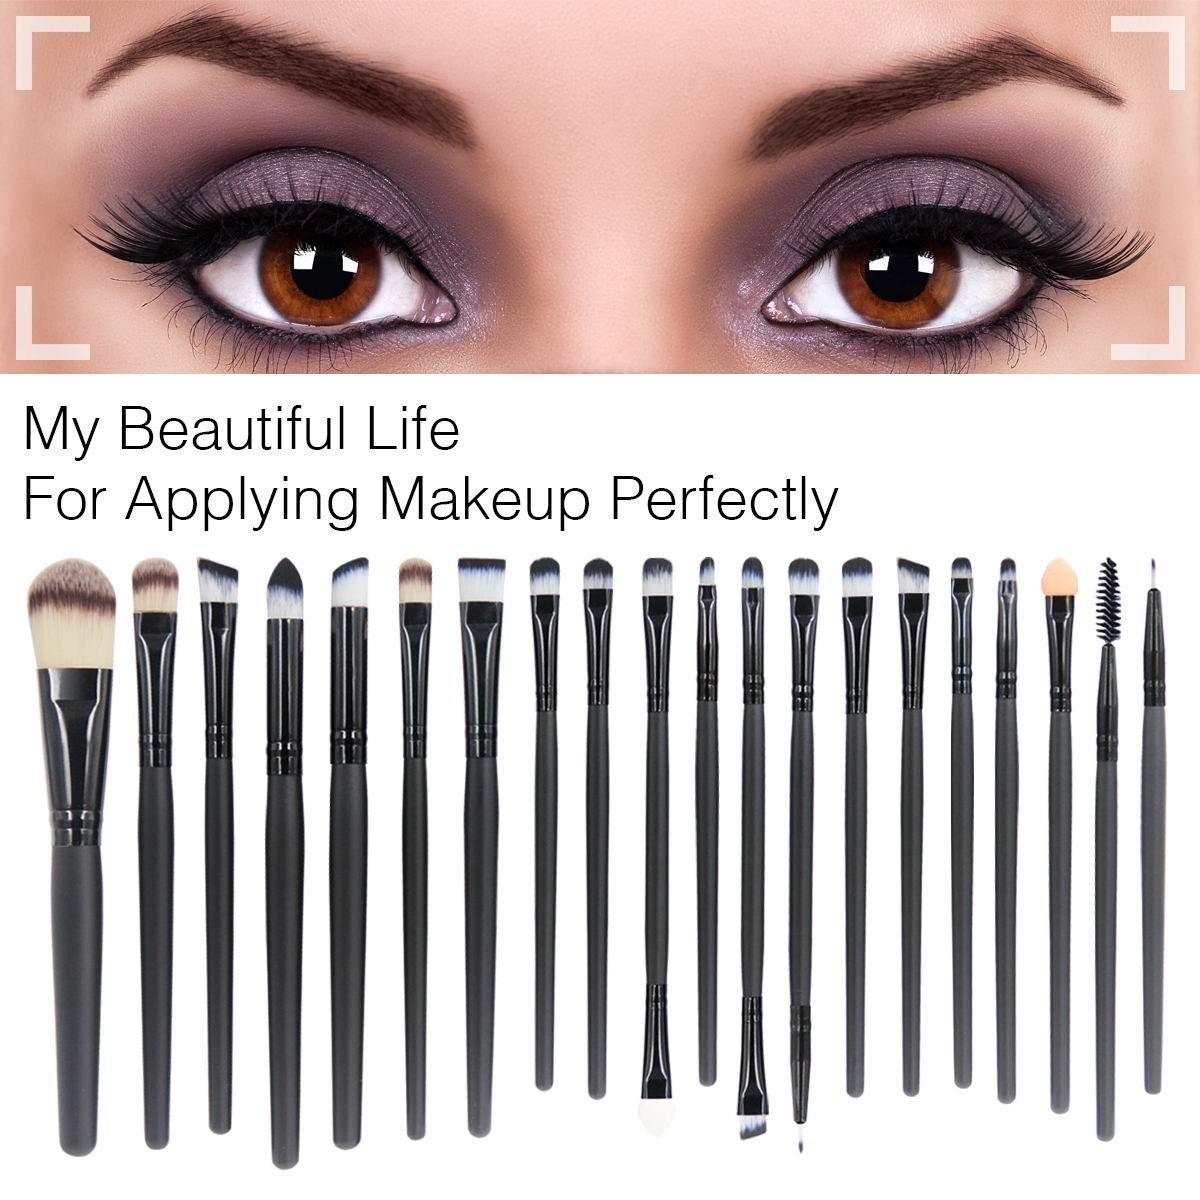 Qj 20 Pieces Makeup Brush Set Professional Face Eye Ql Cosmetic Eyebrow Cream 15 Gr Shadow Eyeliner Foundation Blush Lip Brushes Powder Liquid Cosmetics Blending